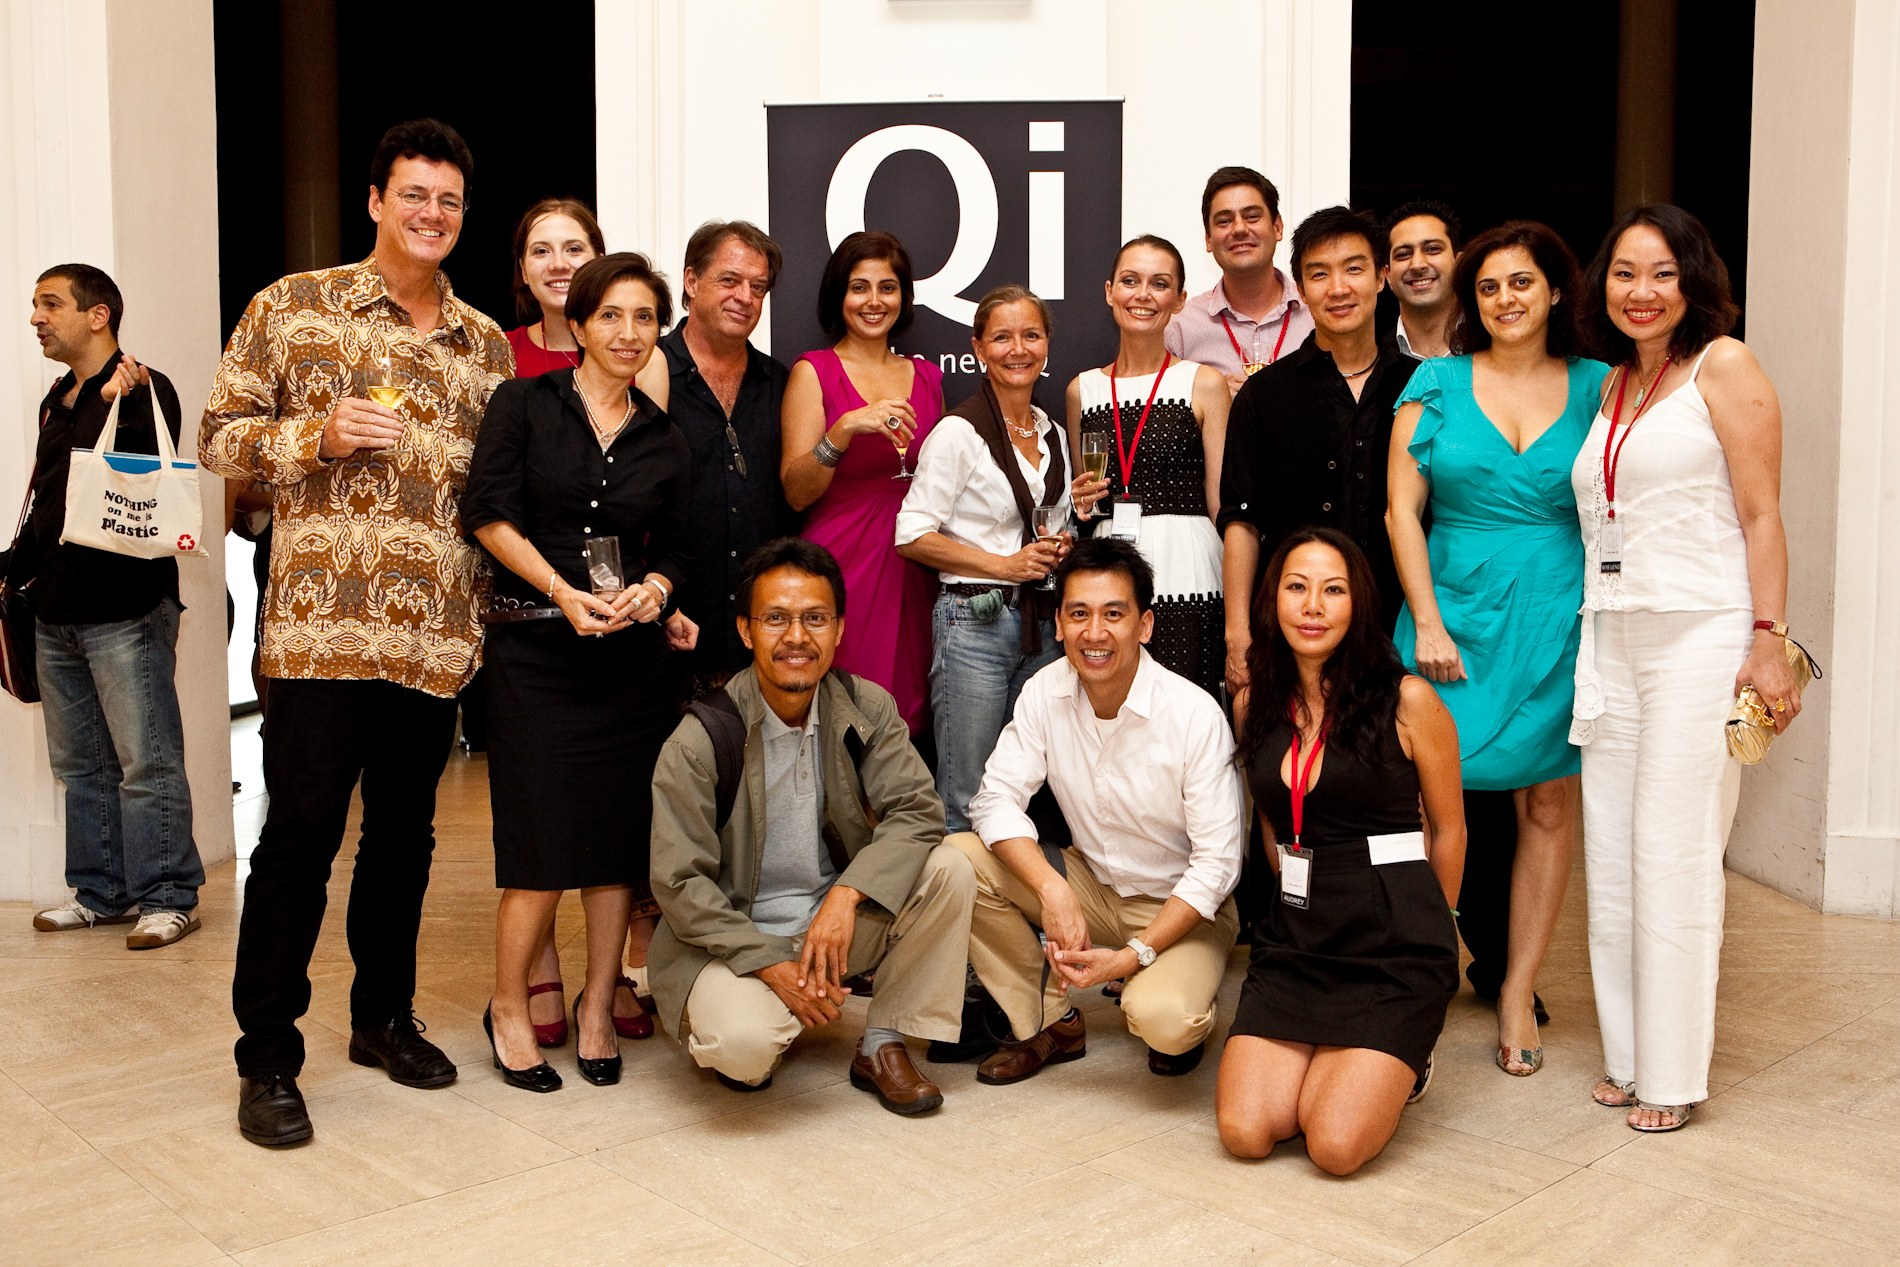 qi-global-2009-sustaible-design-singapore-169.jpg